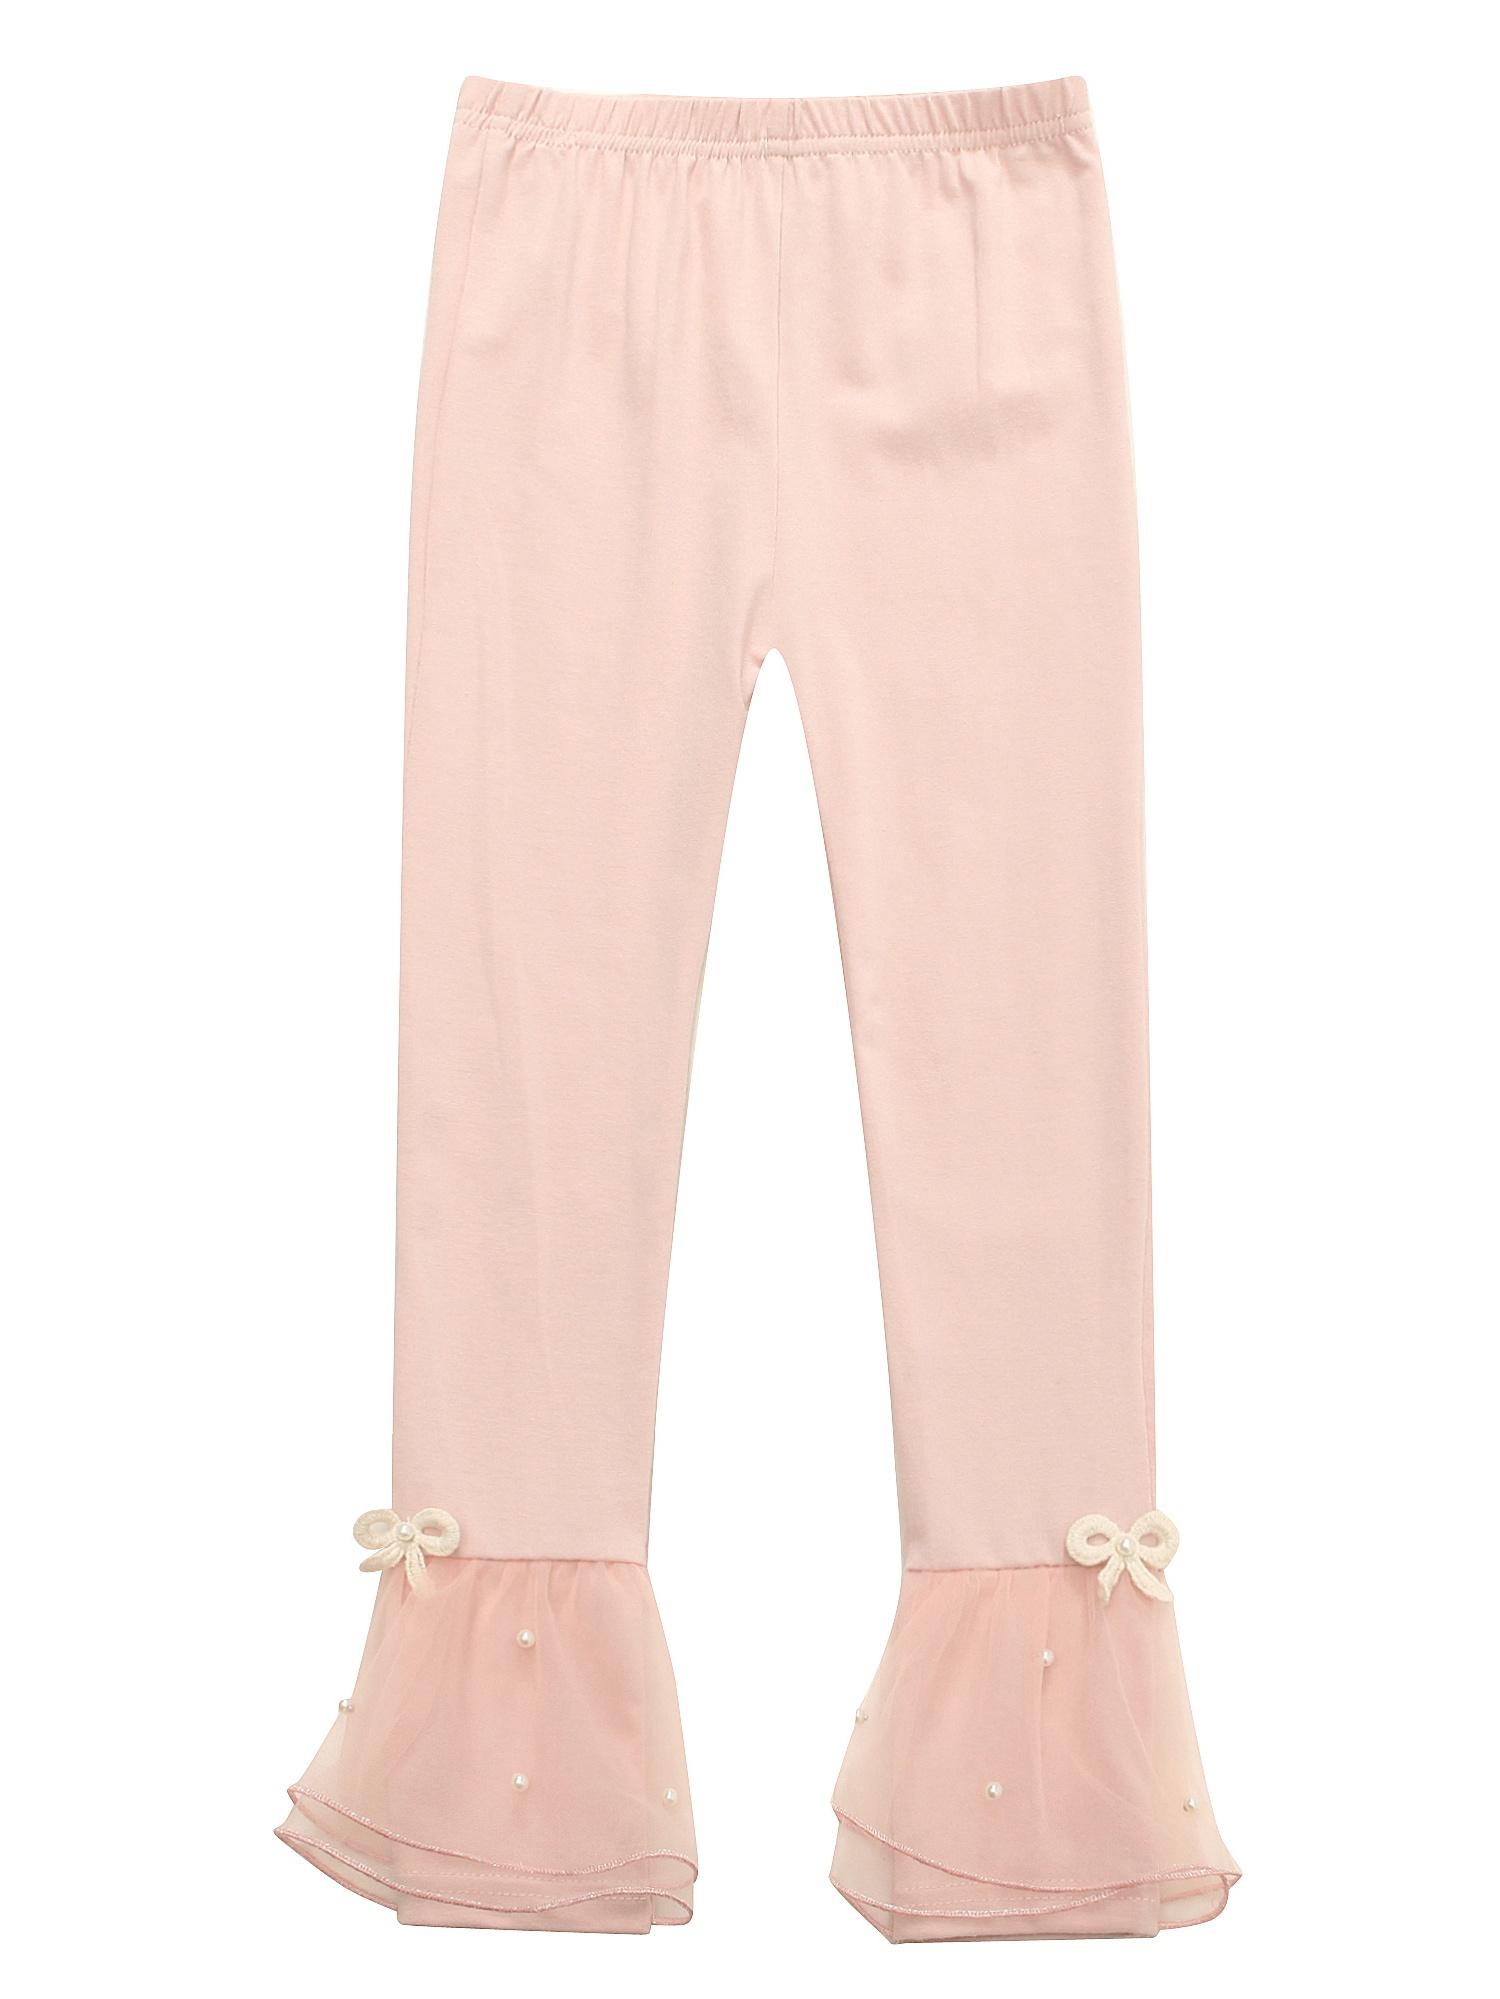 Richie House Little Girls Pink Tiny Bows Ruffled Hem Stretchy Leggings 4/5